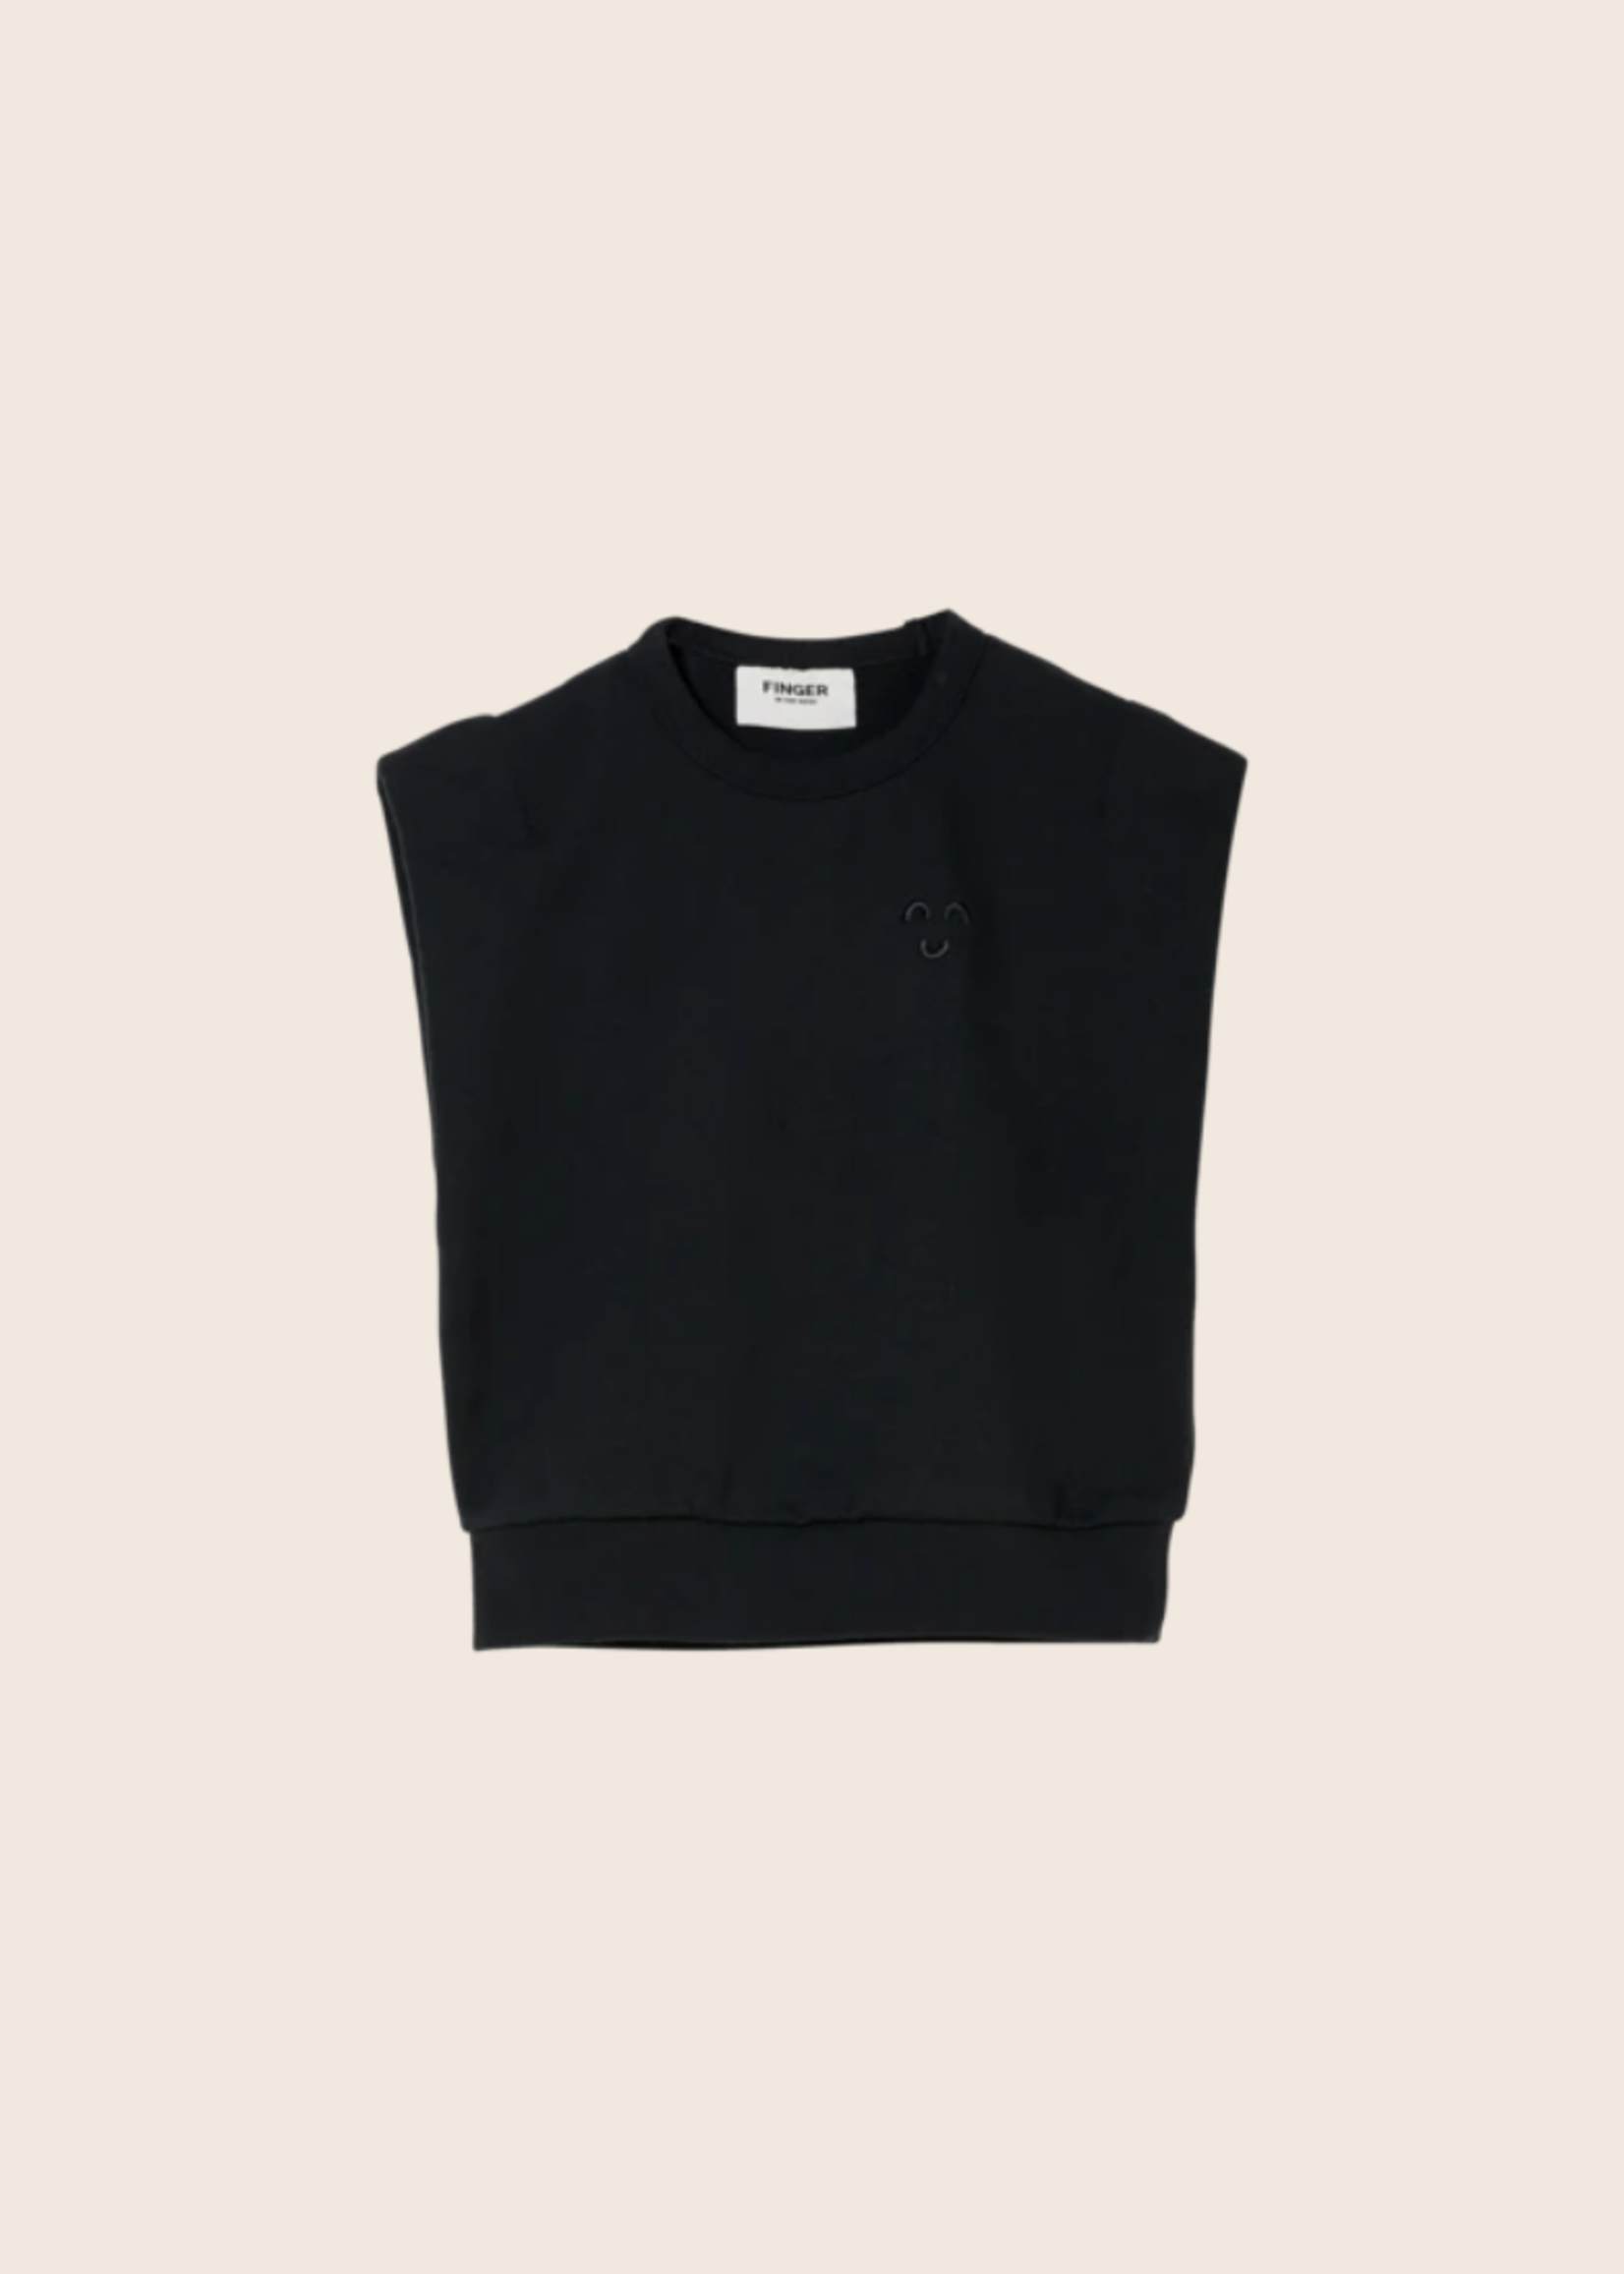 FINGER IN THE NOSE CAROL Ash Black - Sleeveless Sweater